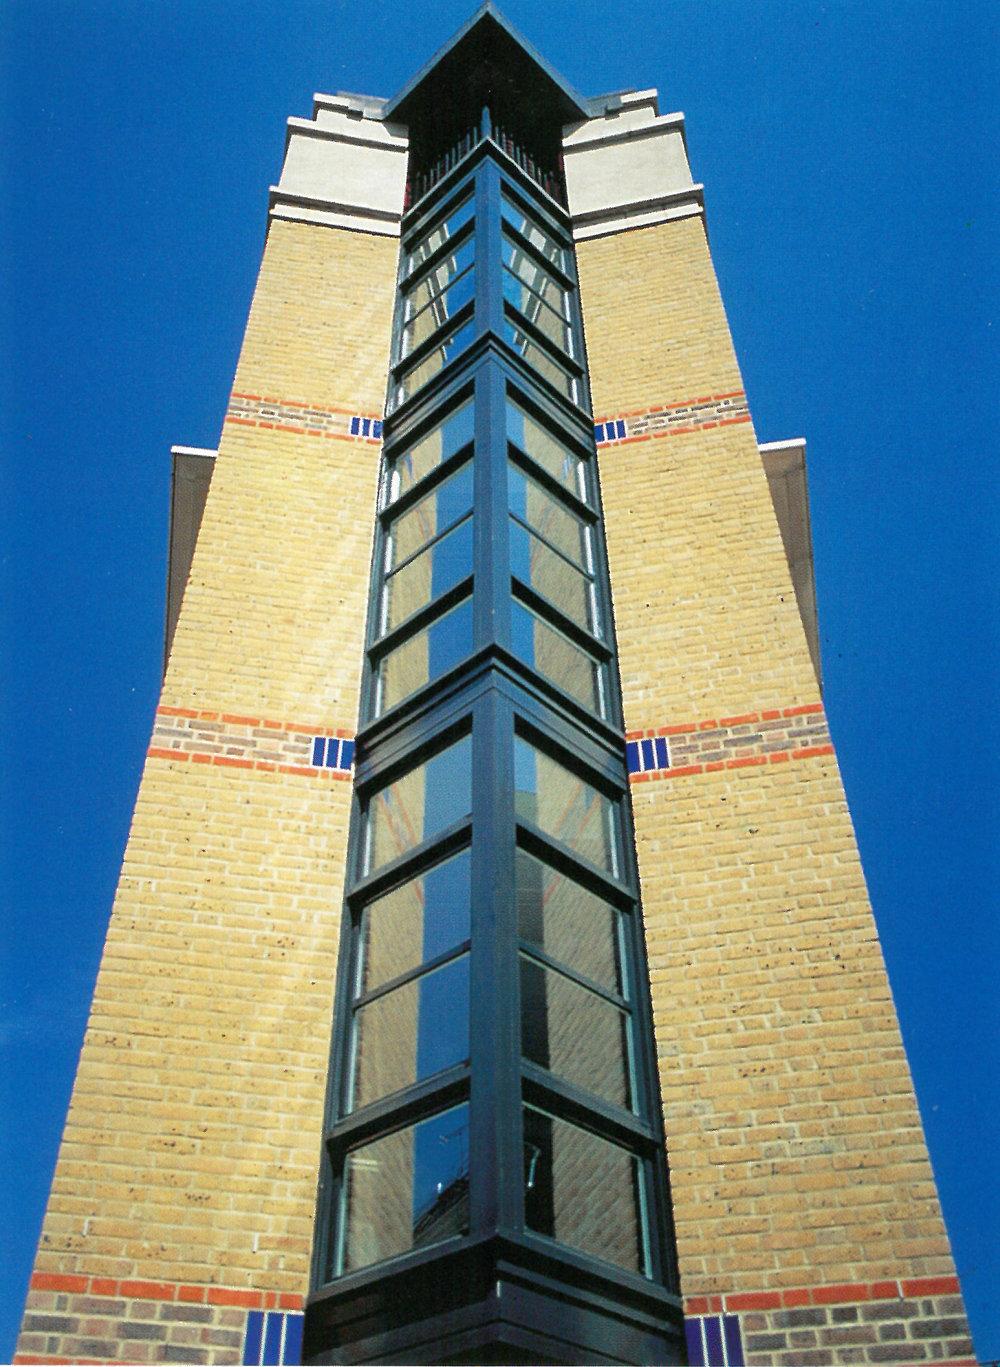 Comyn Ching Traingle_corner building_1995.jpg